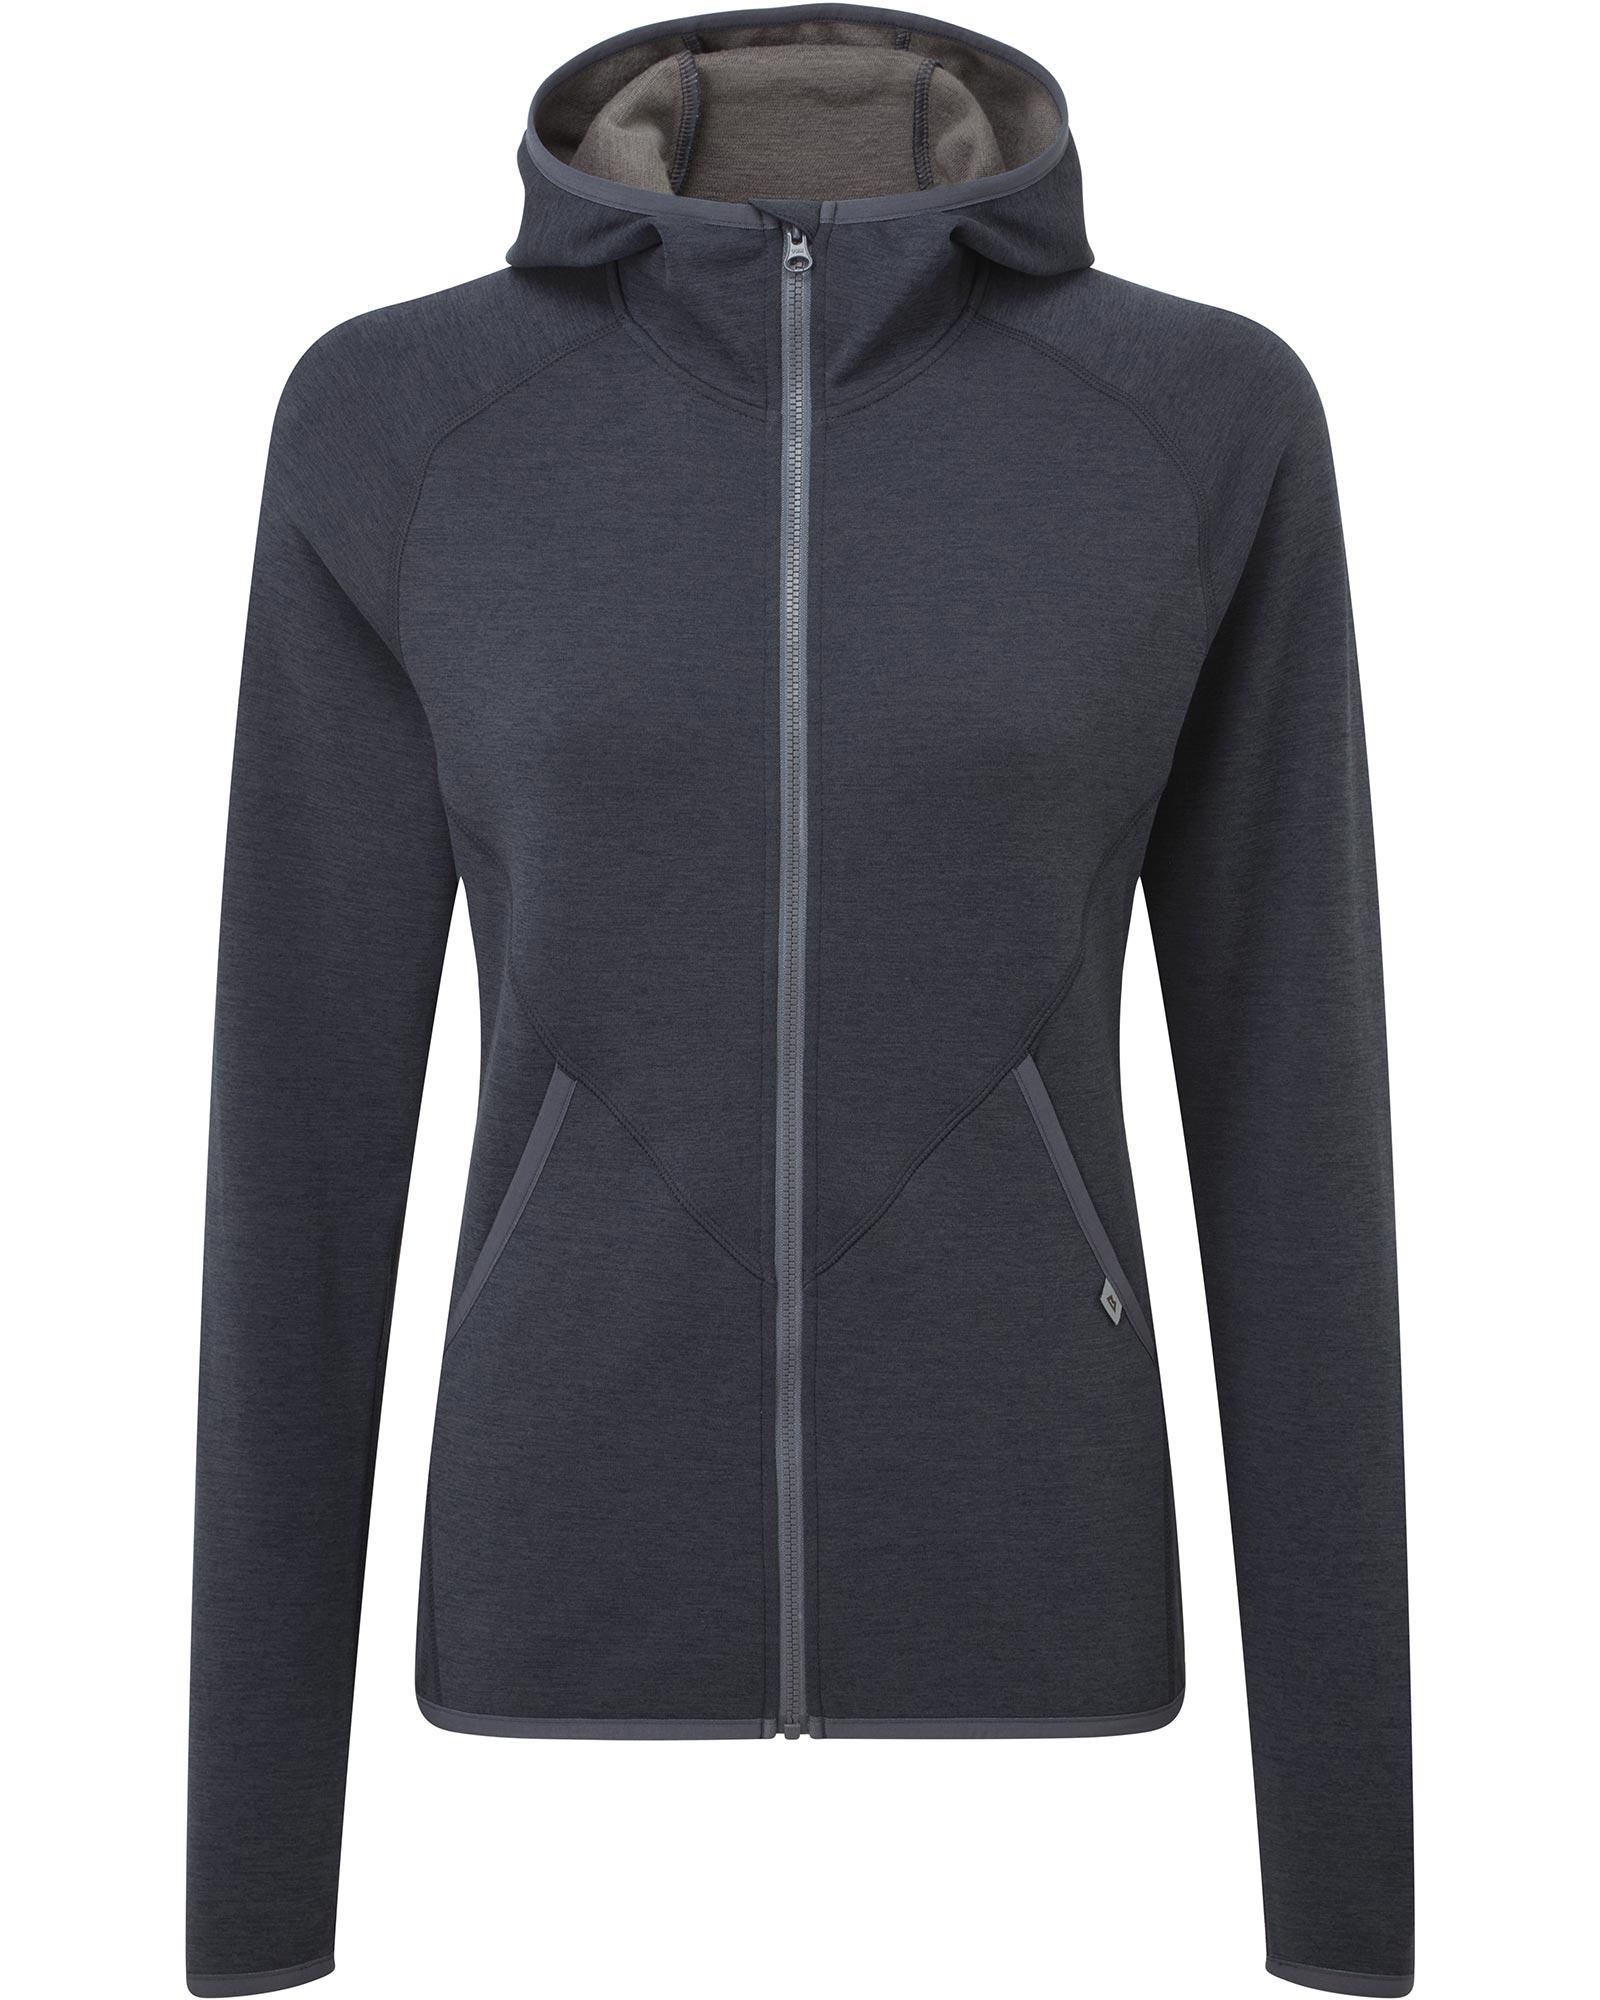 Mountain Equipment Women's Calico Hooded Jacket 0